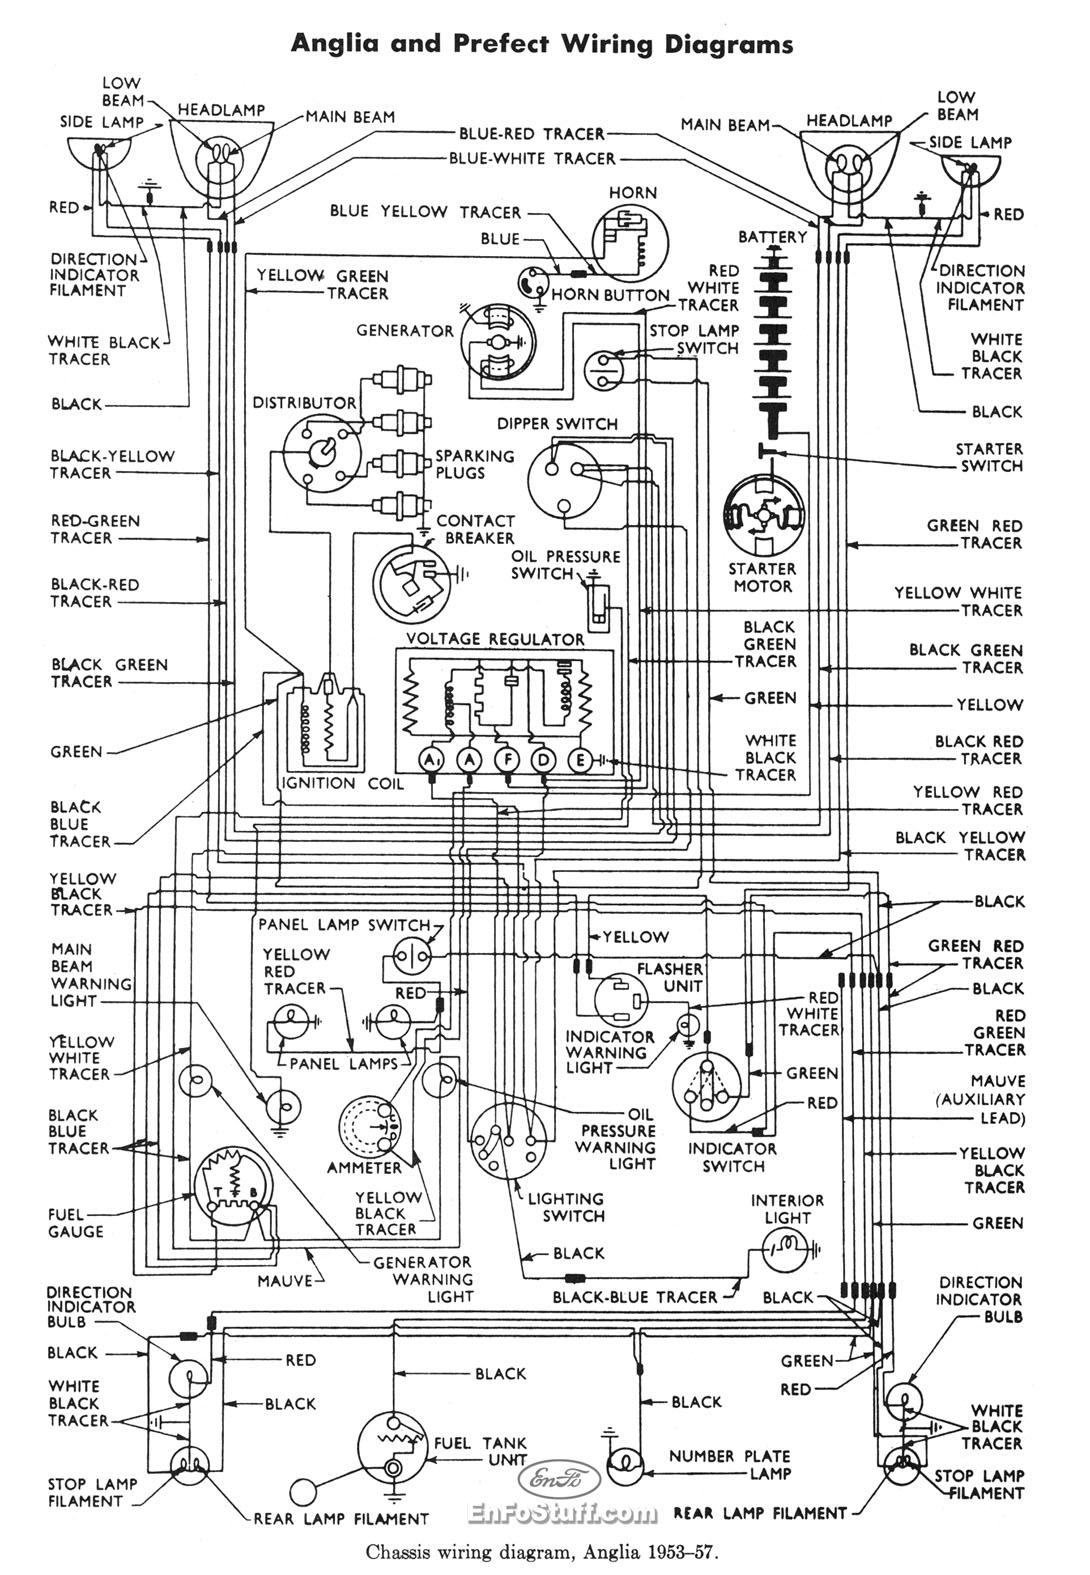 1993 Ford F800 Wiring Diagram - Wiring Diagrams SchematicAsnières Espaces Verts